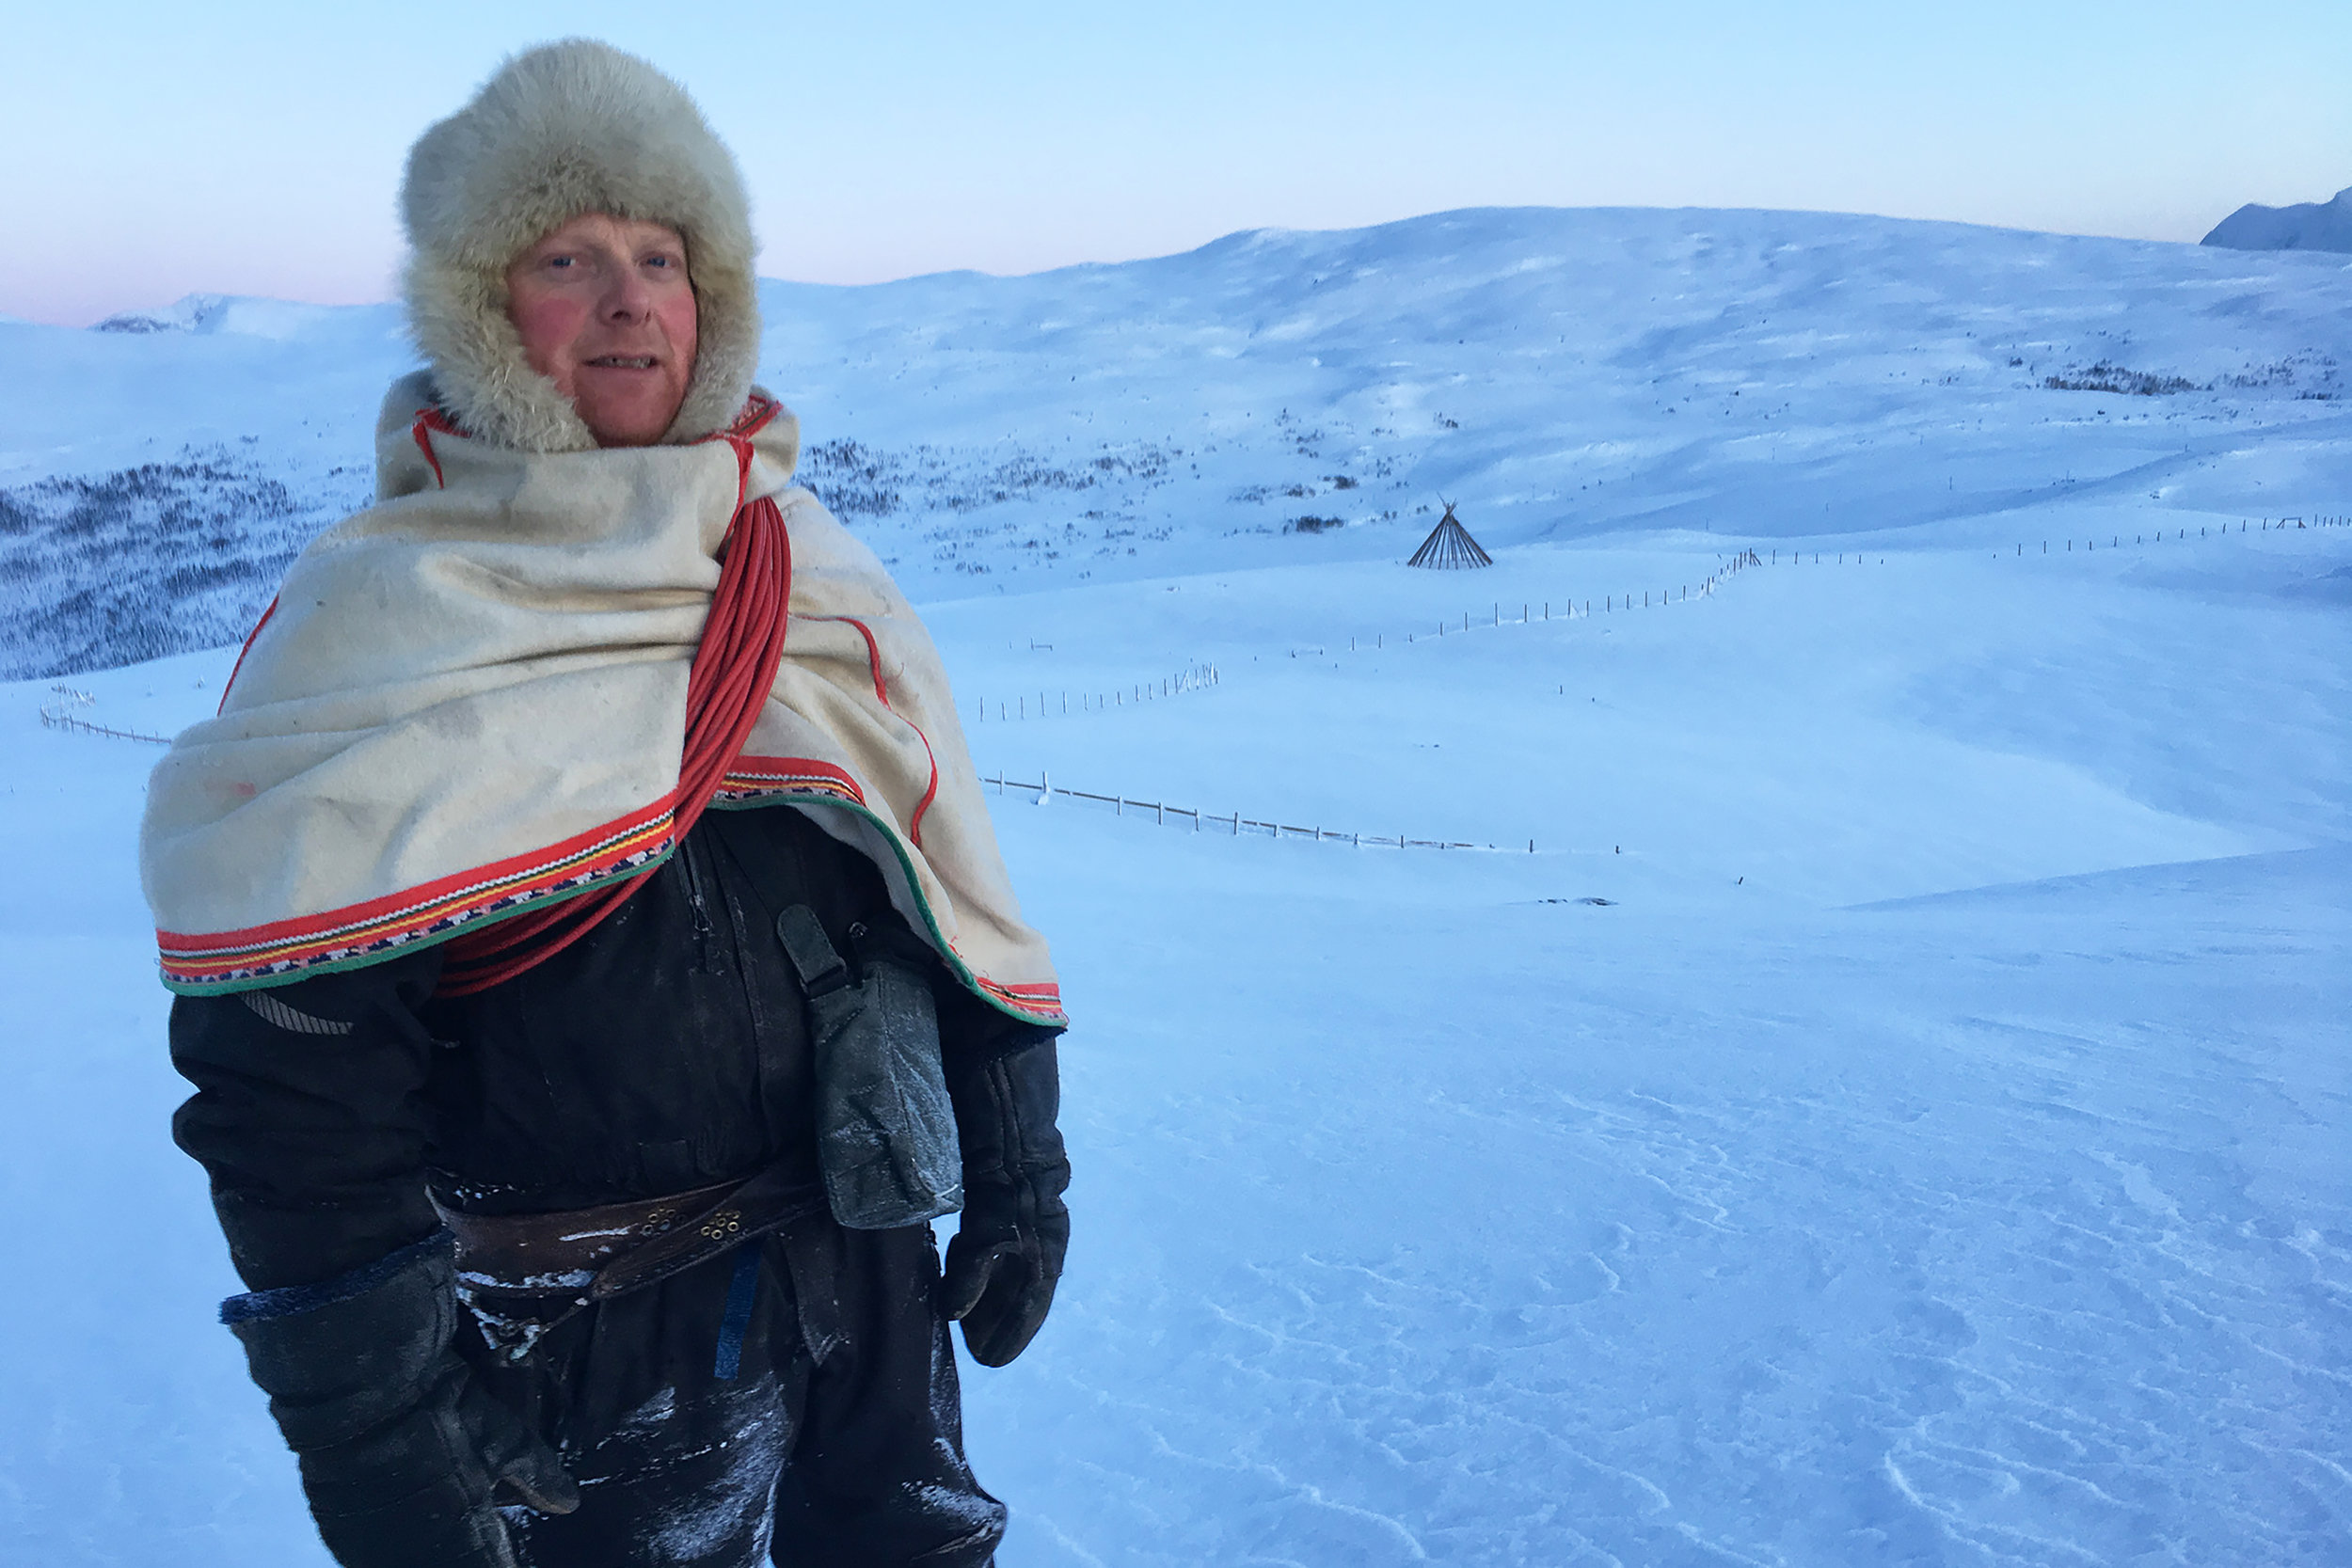 Reiulf Aleksandersen on his family's reindeer herding land